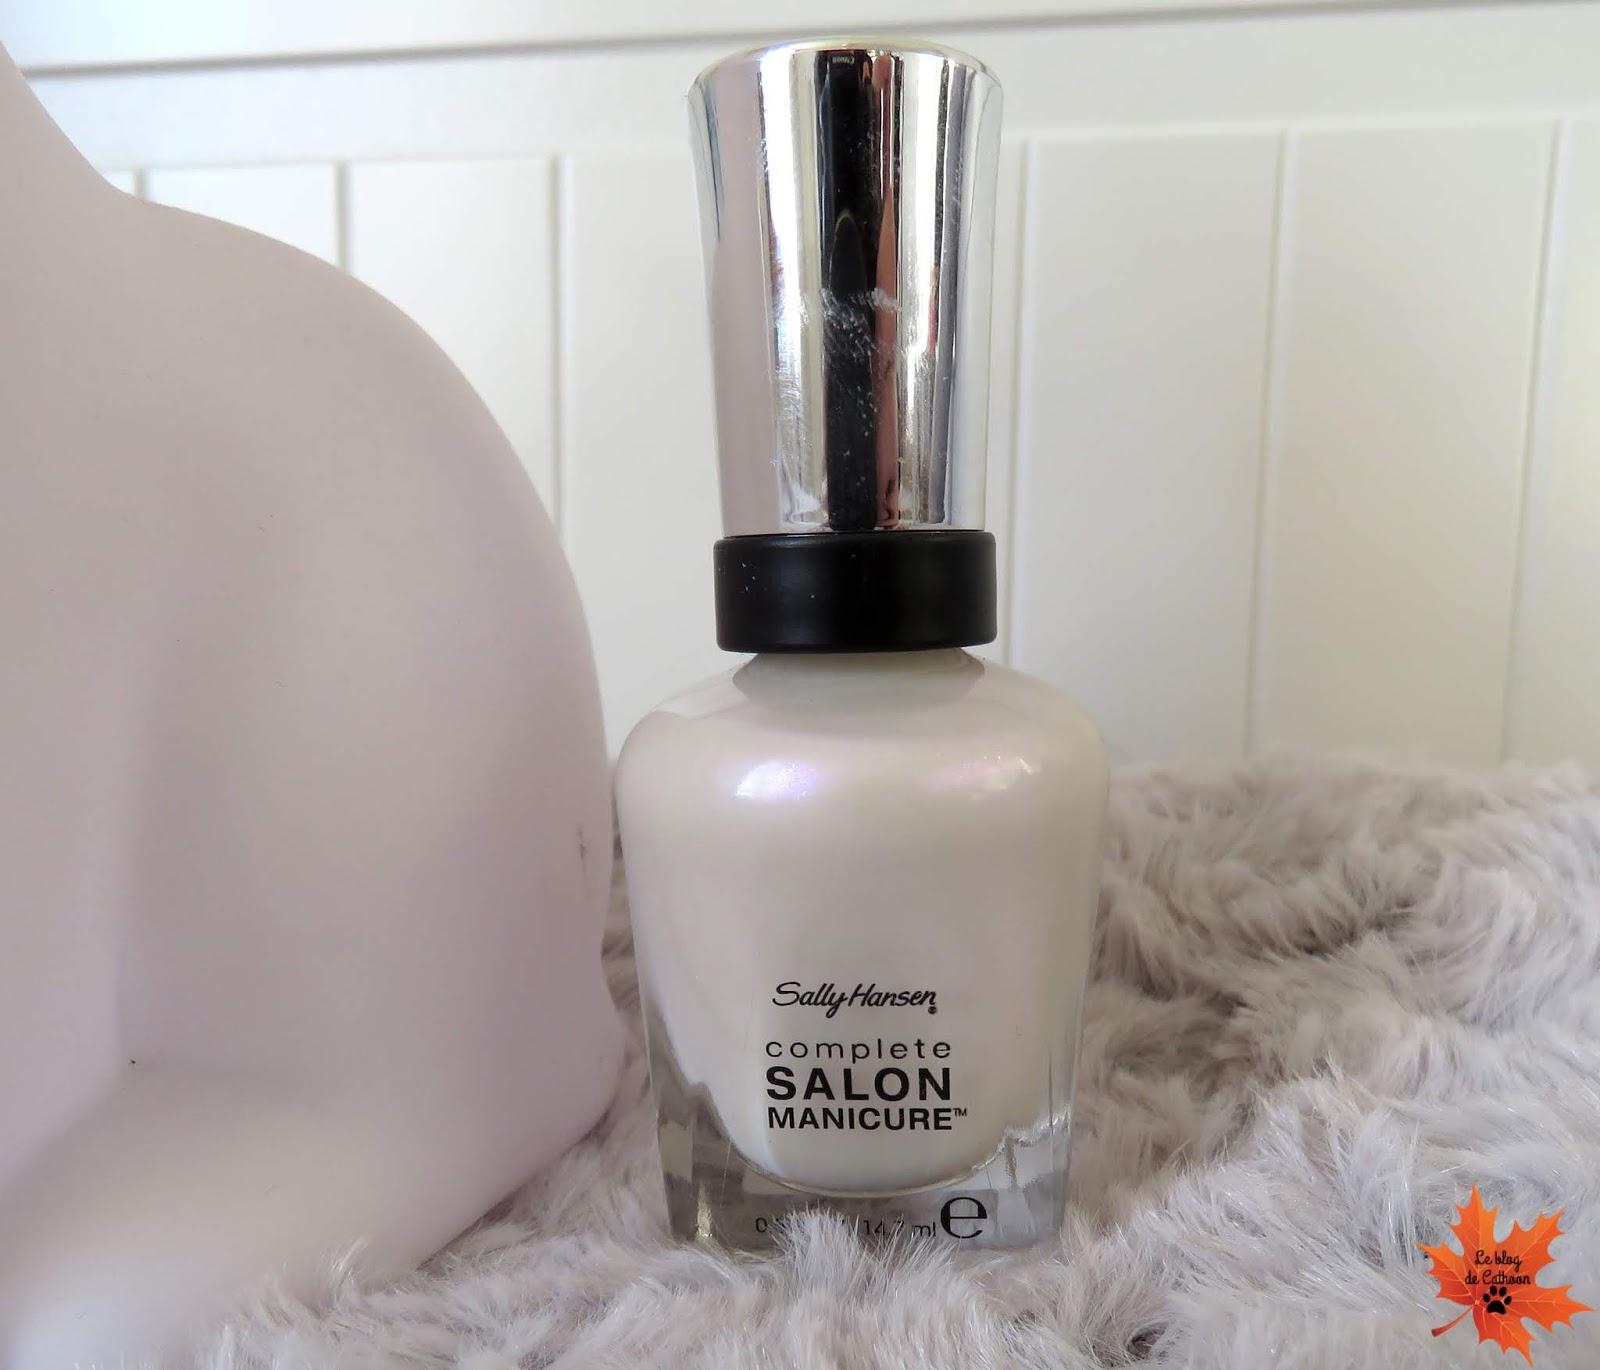 120 Luna Pearl - Complete Salon Manicure - Vernis à Ongles - Sally Hansen